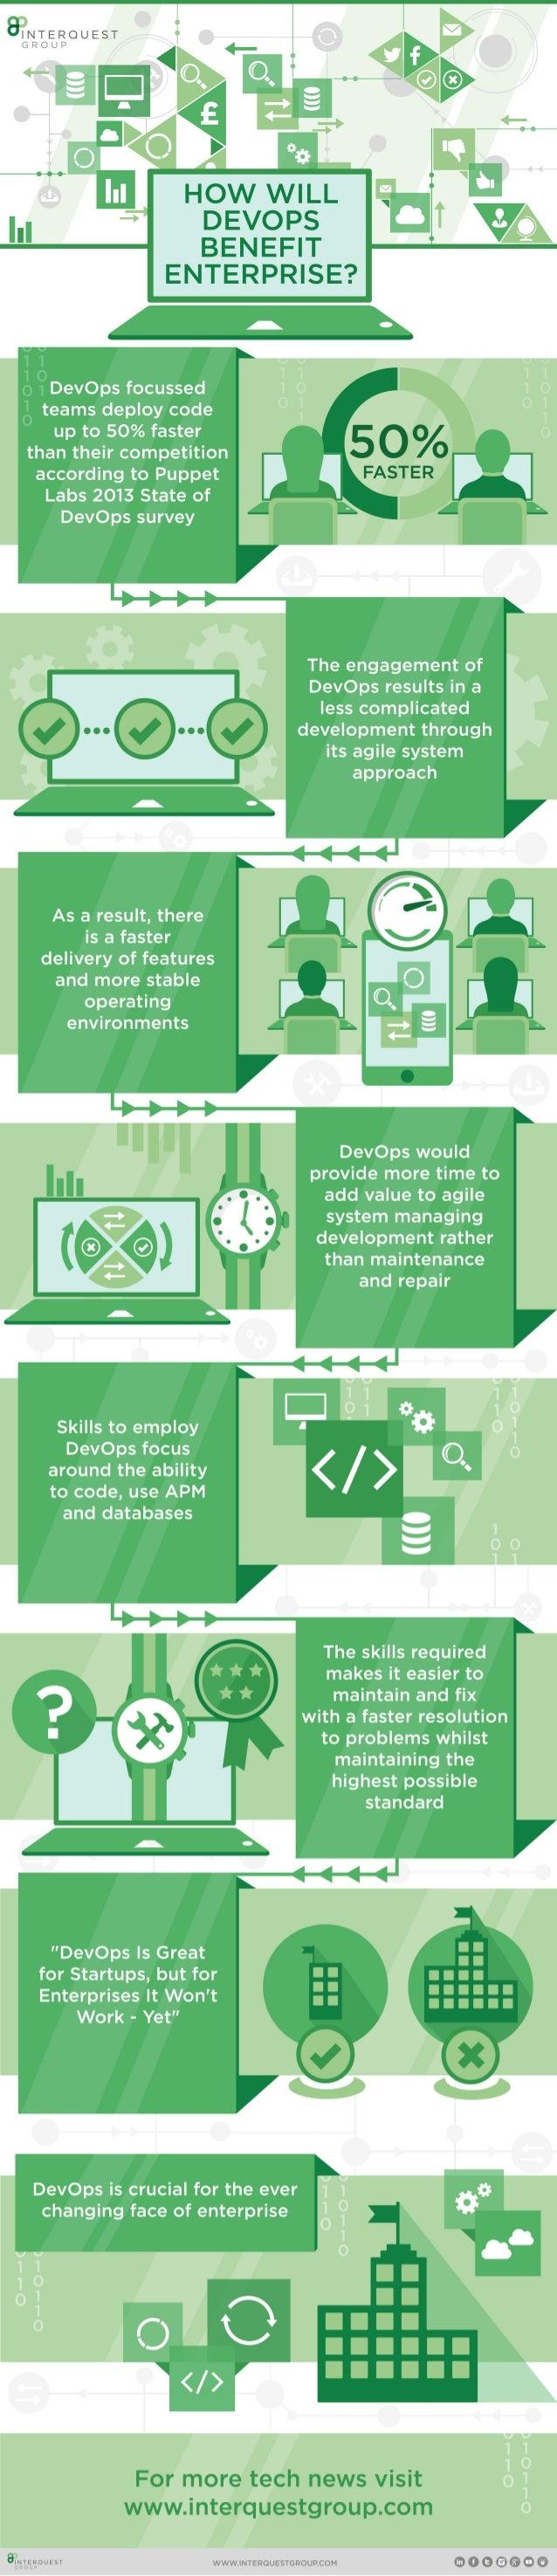 How will DevOps benefit enterprise?